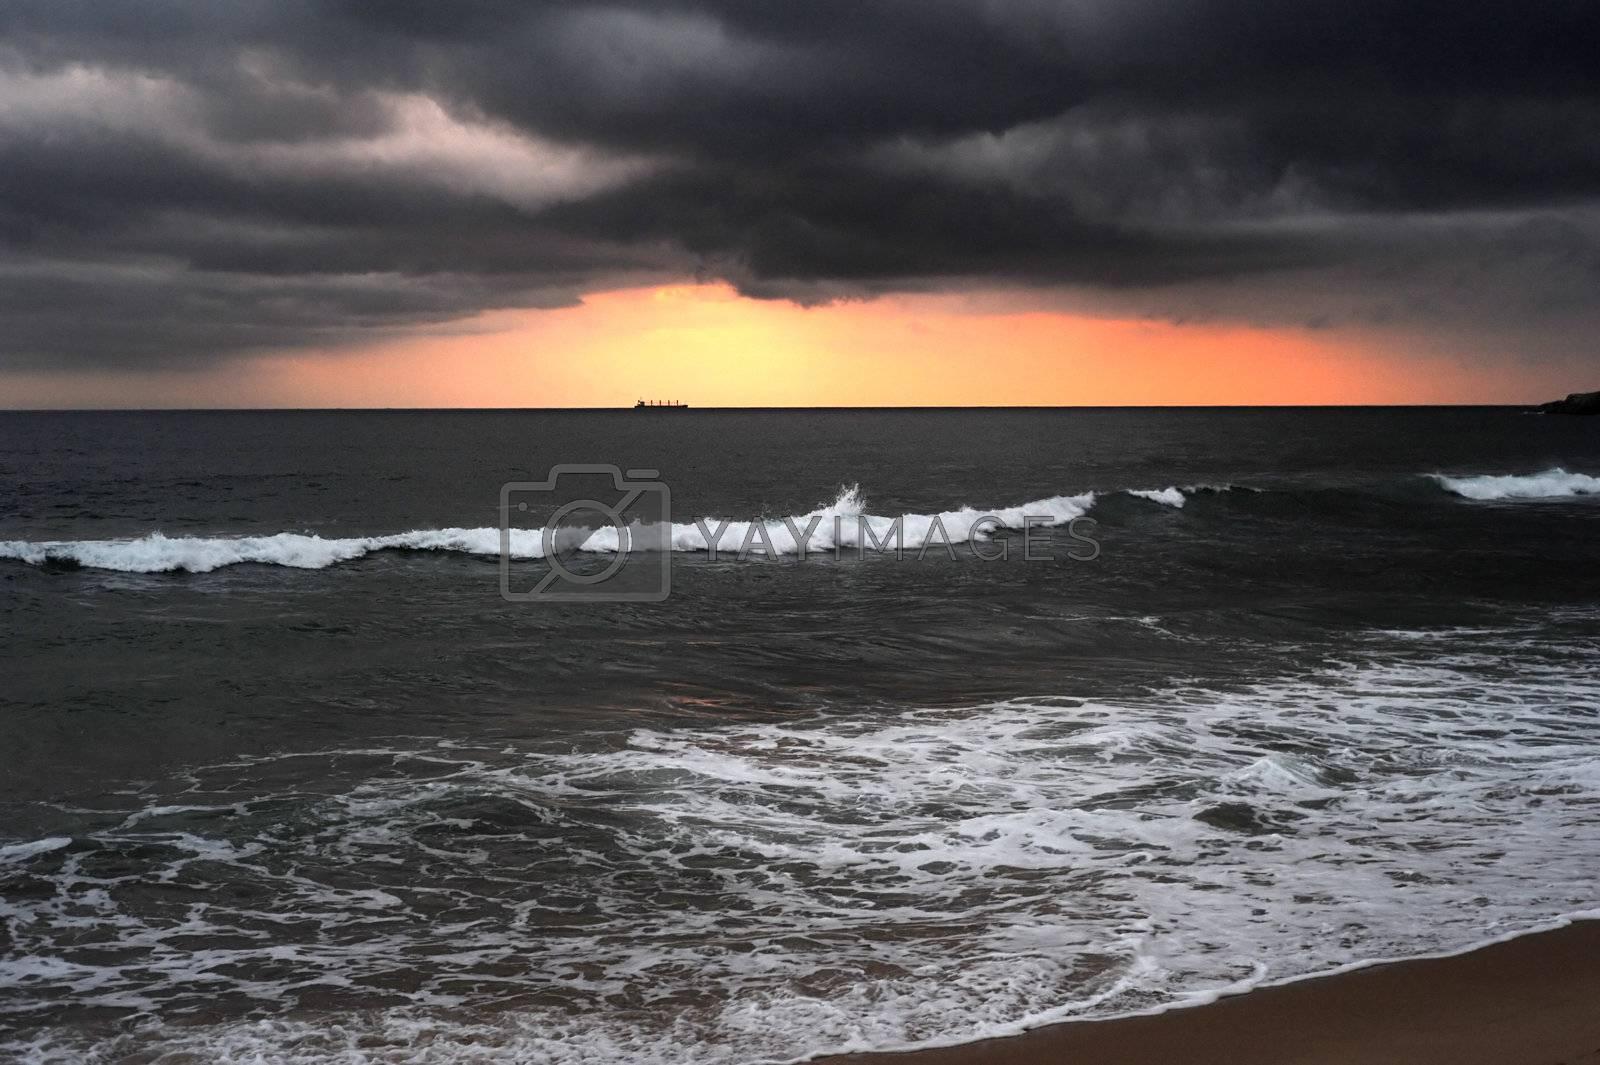 Dramatic sunset in the Indian ocean. Sri Lanka